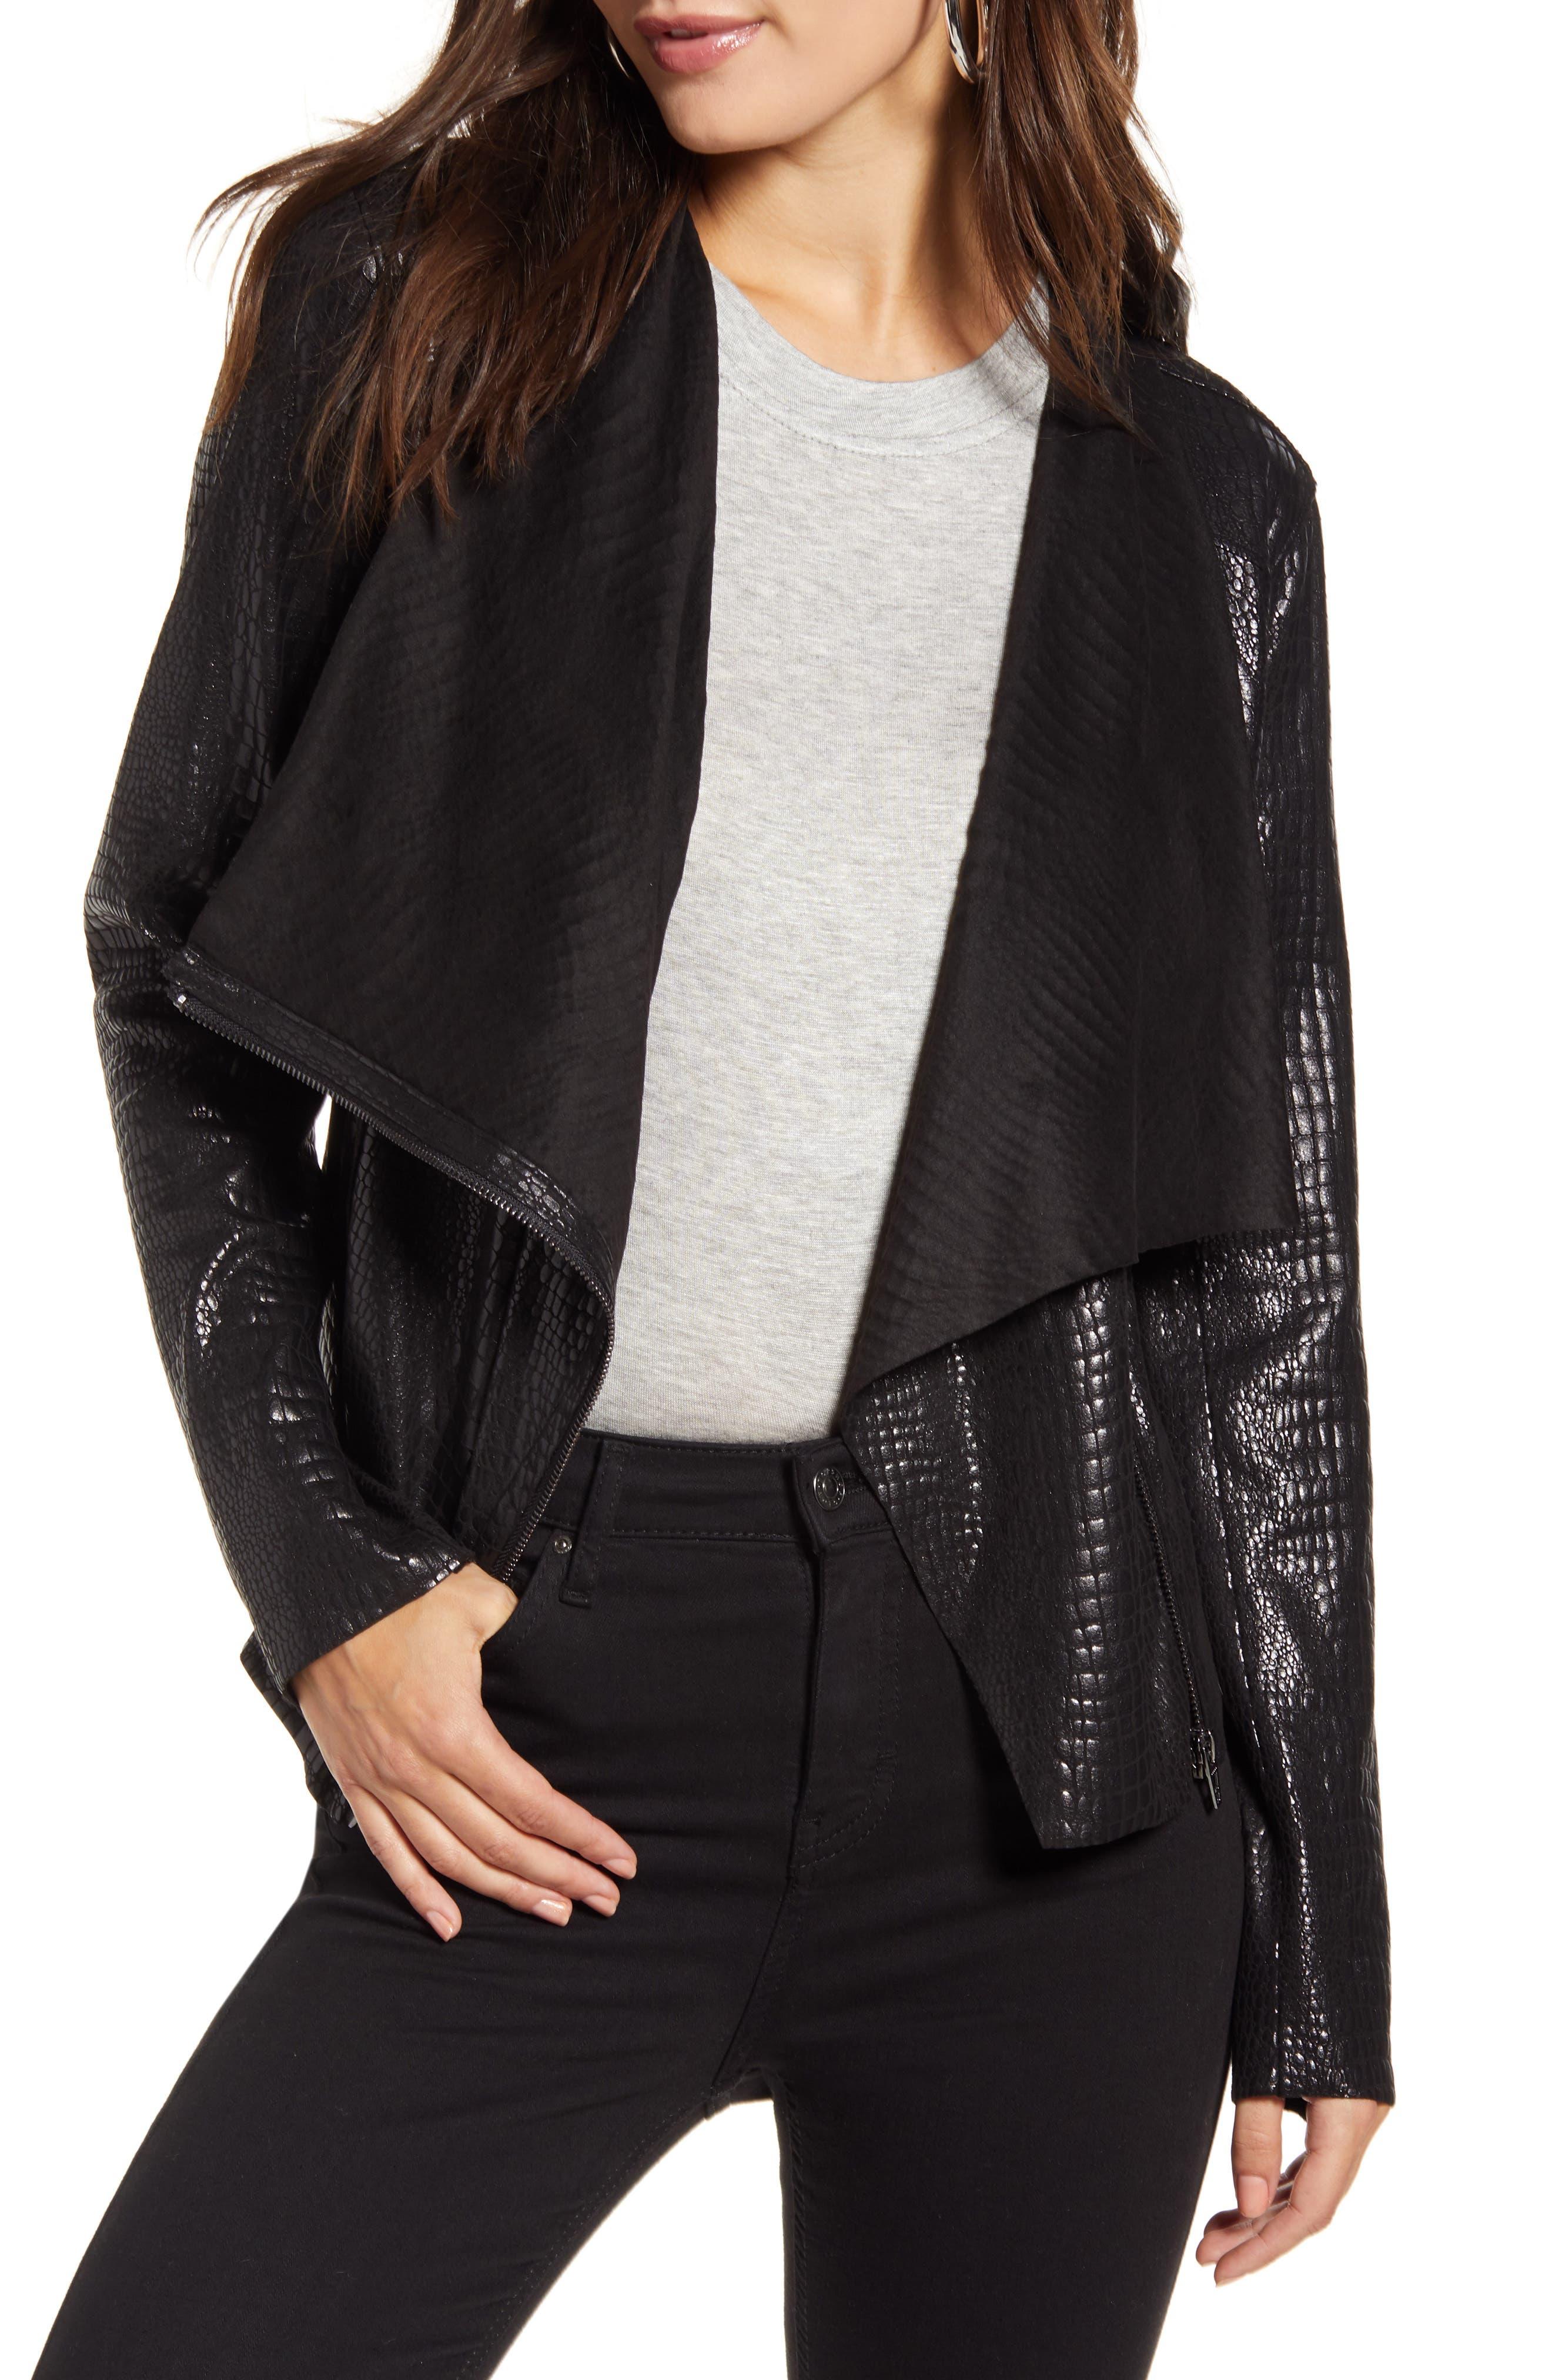 BLANKNYC Iron Girl Croc Embossed Faux Leather Jacket